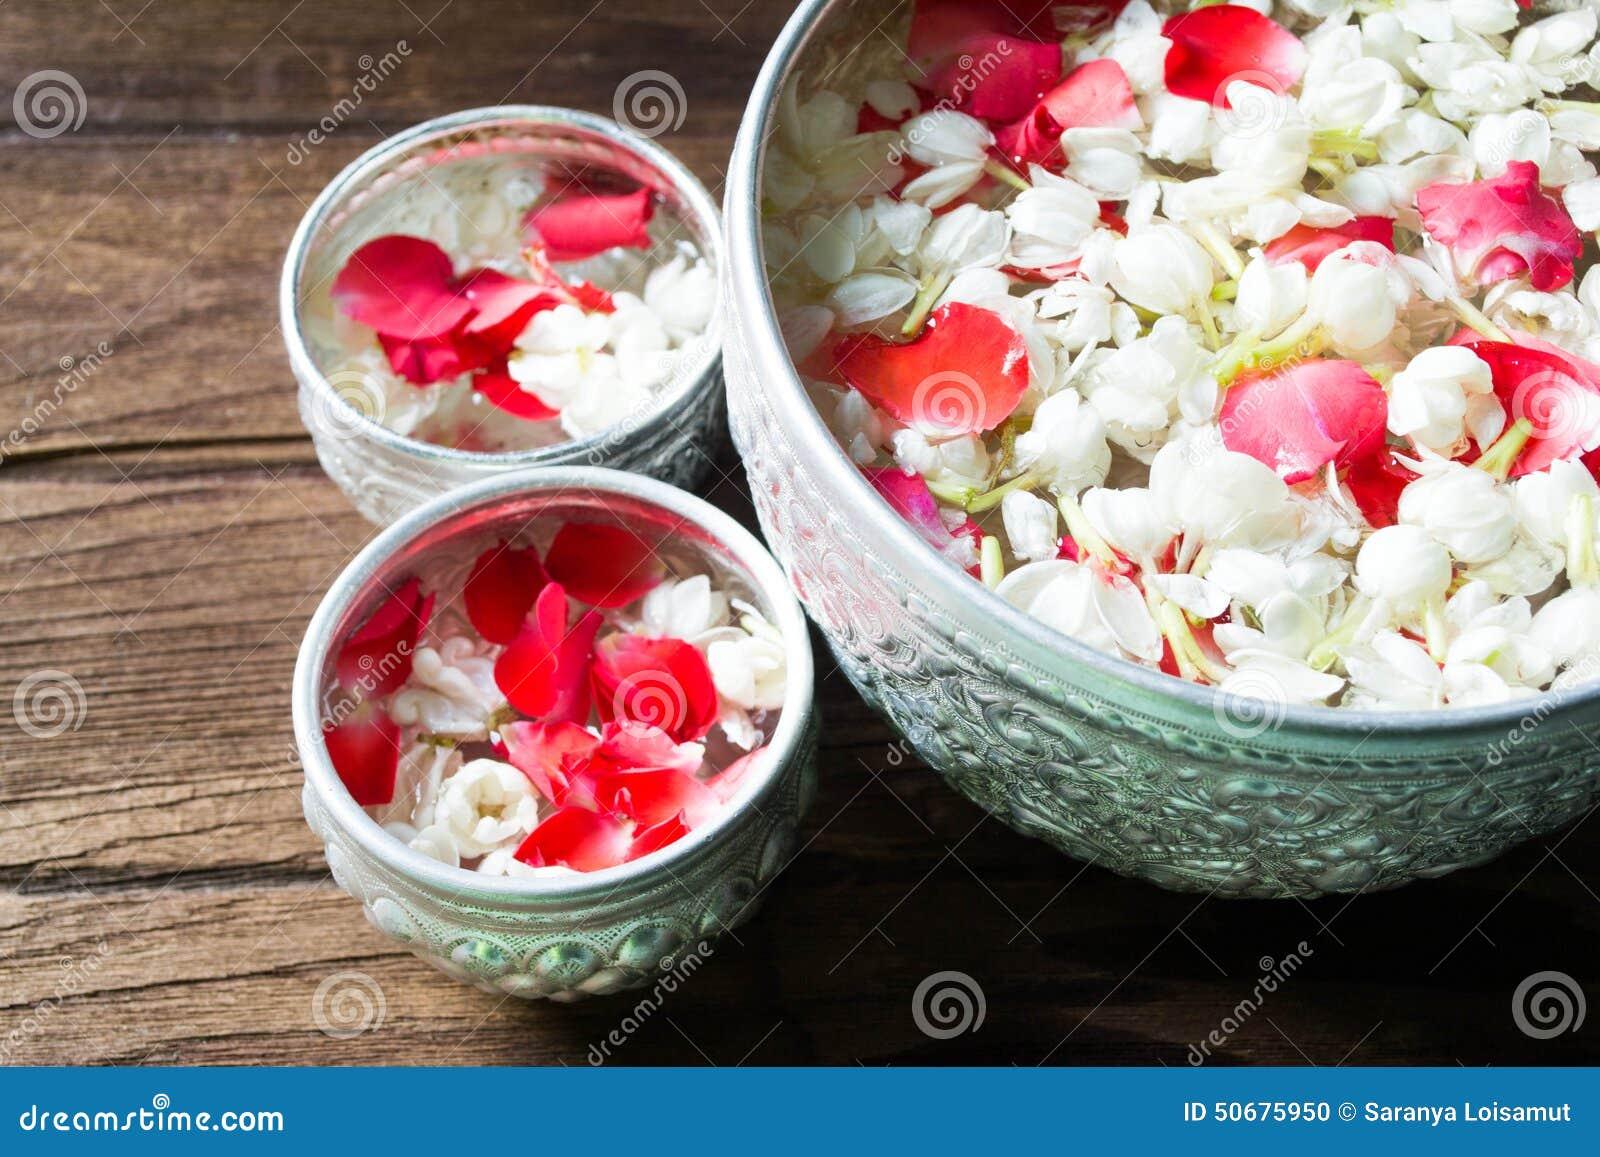 Download 浇灌在与香水混合的碗并且开花Songkra的花冠 库存照片. 图片 包括有 阵雨, 的btu, 安排, 全部 - 50675950